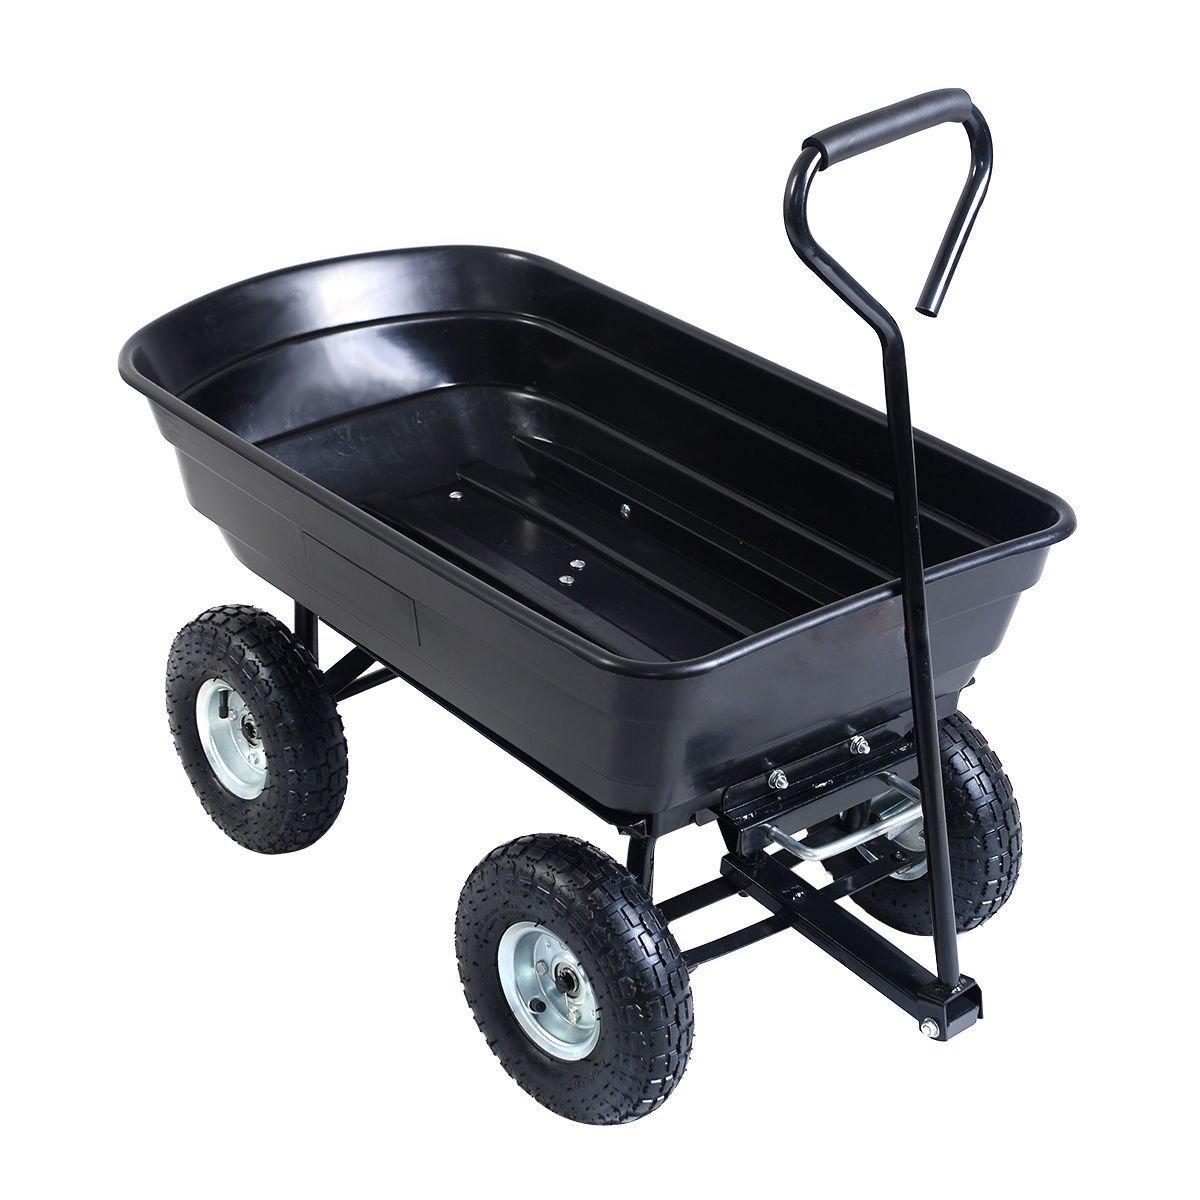 EAZYGOODS Garden Dump Cart 75L 300 kg Wheelbarrow Tipping Trolley Utility Truck Trailer Black